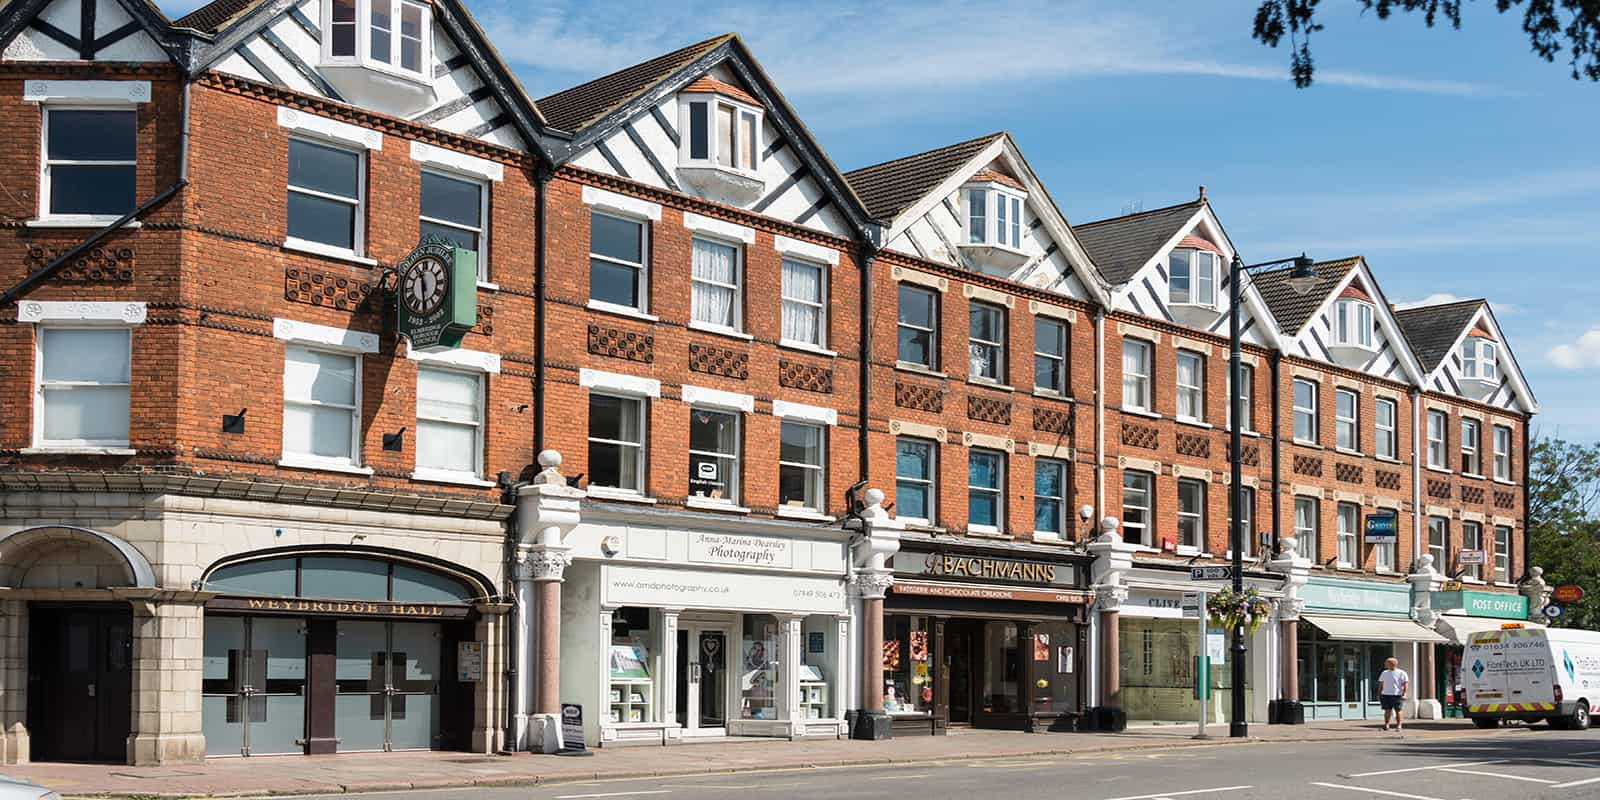 Period shop frontages, Church Street, Weybridge, Surrey, England, United Kingdom